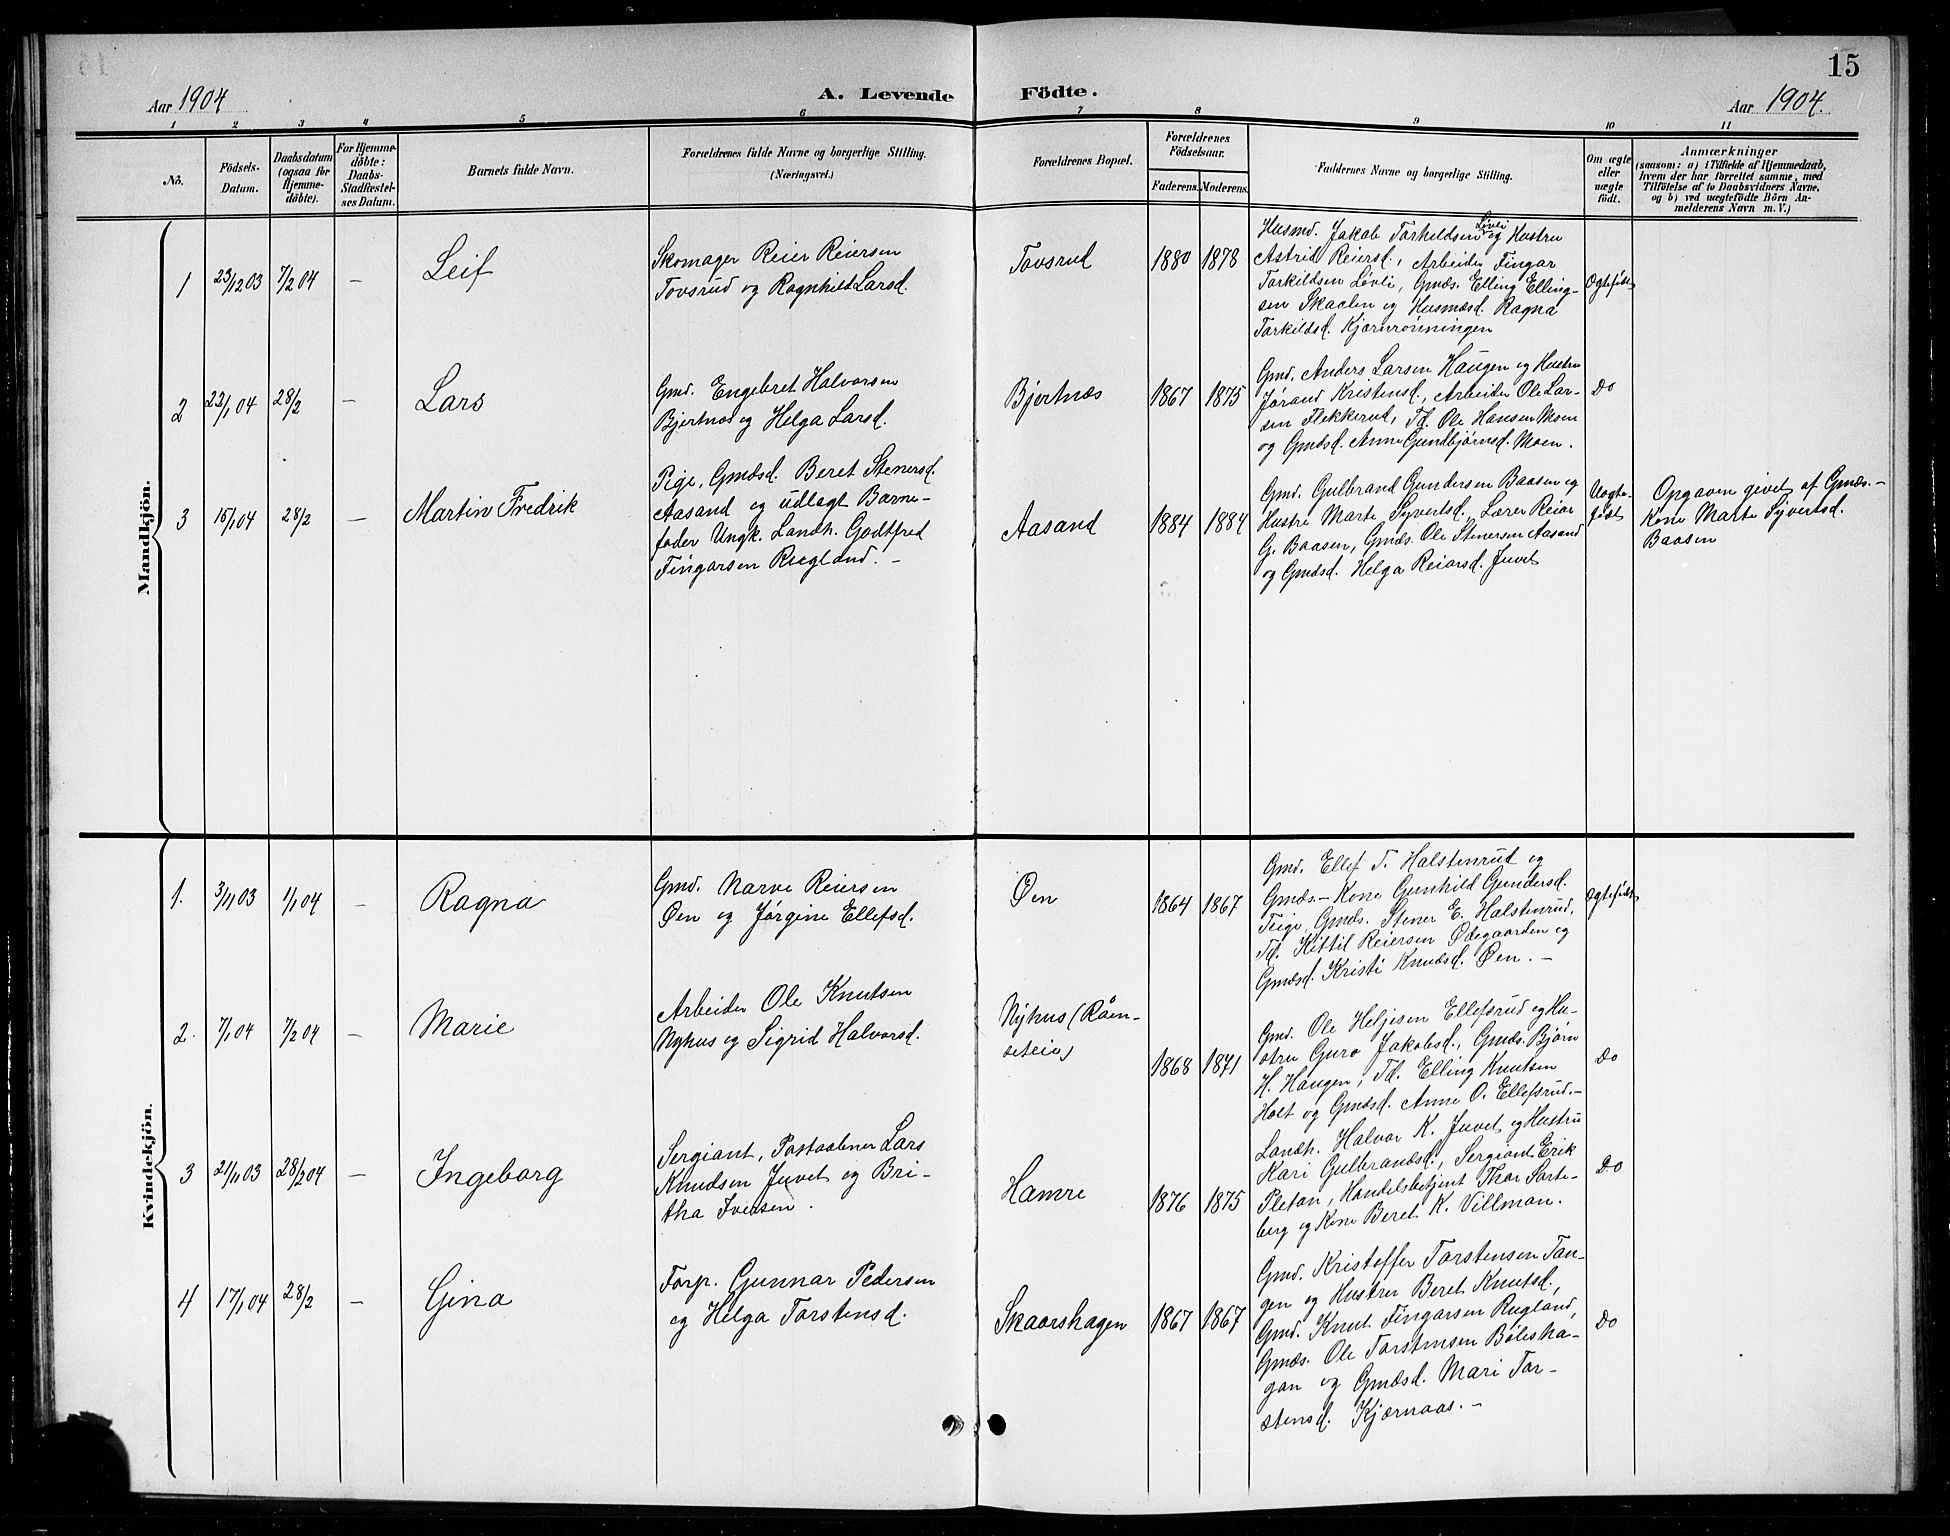 SAKO, Sigdal kirkebøker, G/Gb/L0003: Klokkerbok nr. II 3, 1901-1916, s. 15